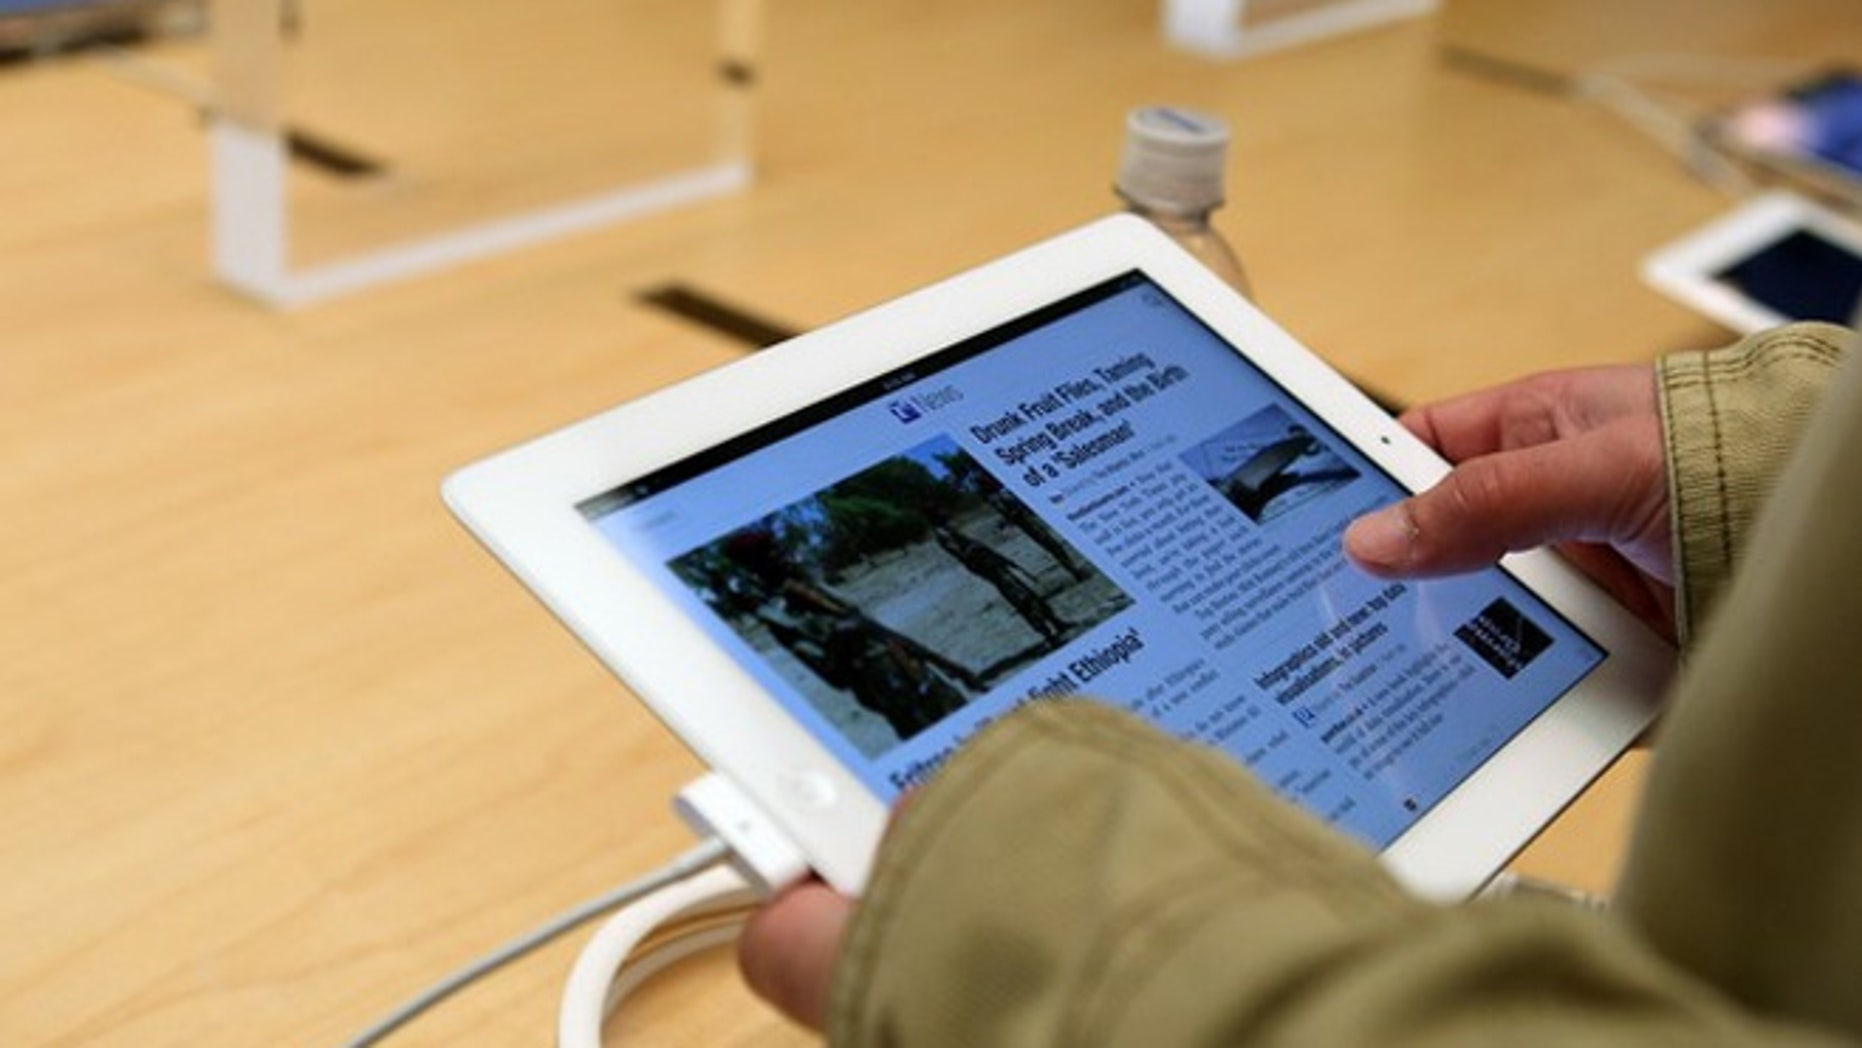 Is an 'iPad mini' coming this fall?